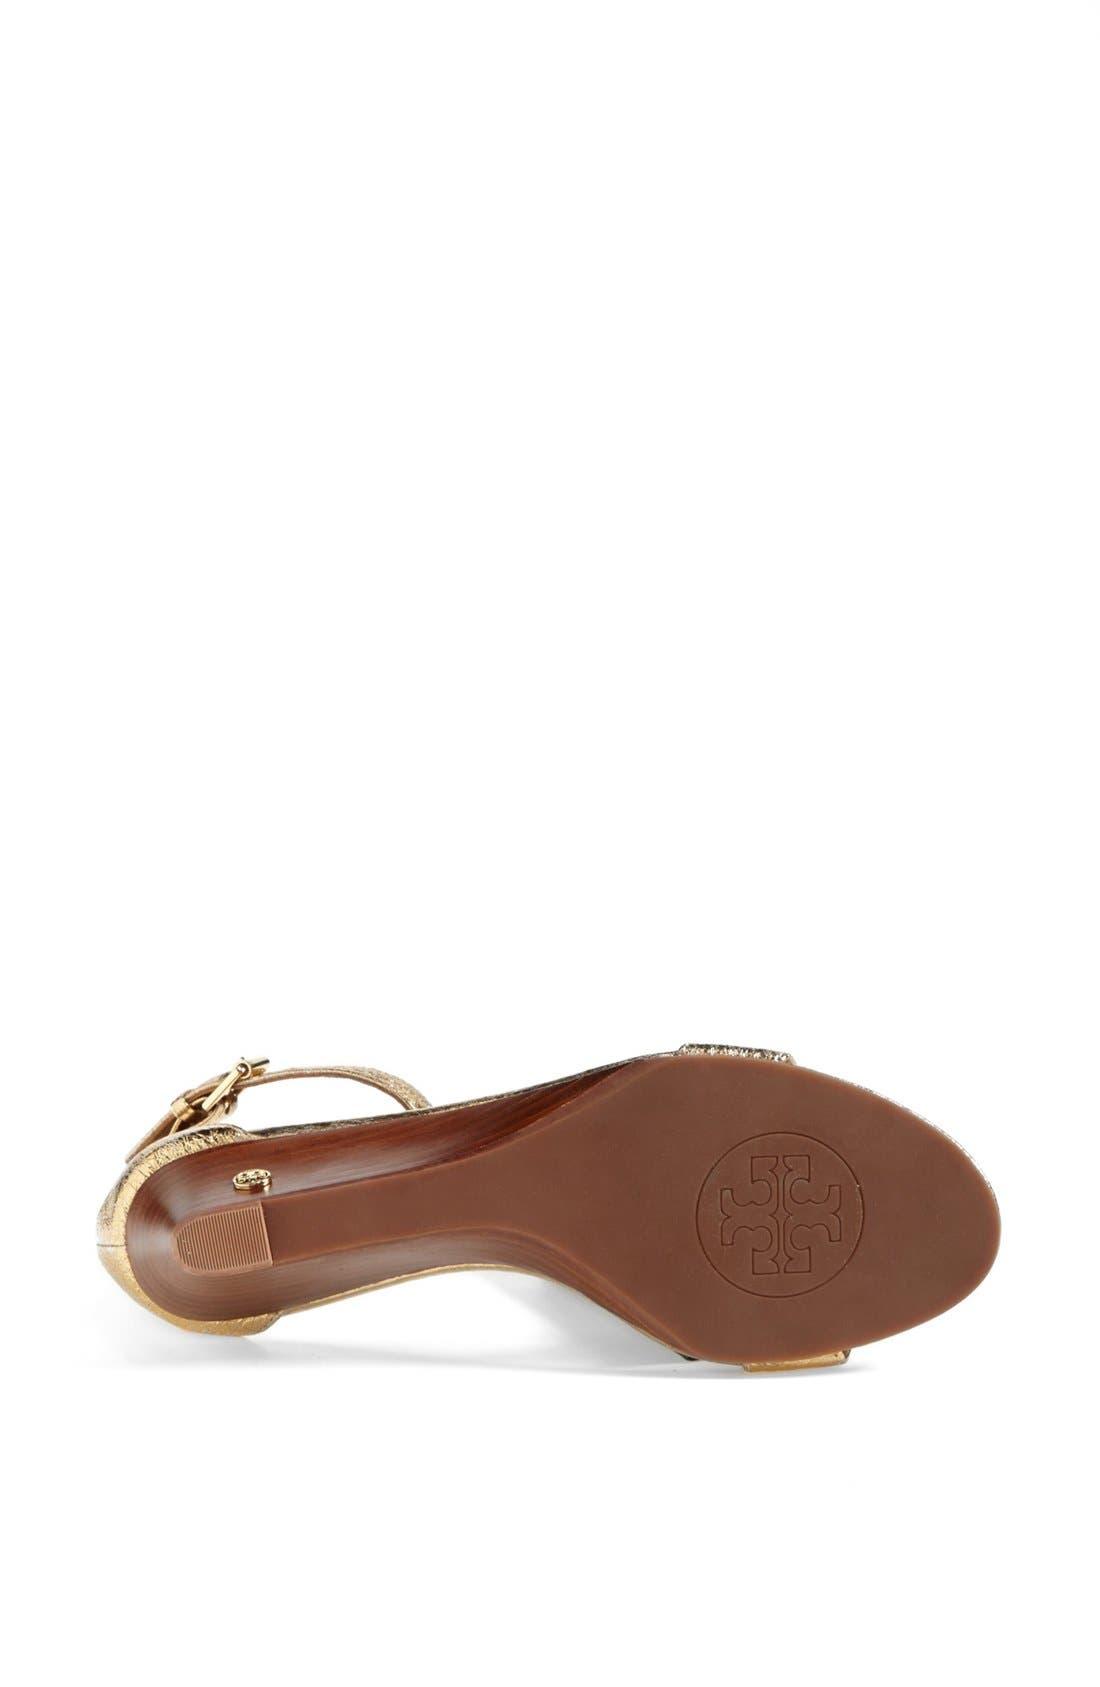 'Savannah' Wedge Sandal,                             Alternate thumbnail 3, color,                             Gold